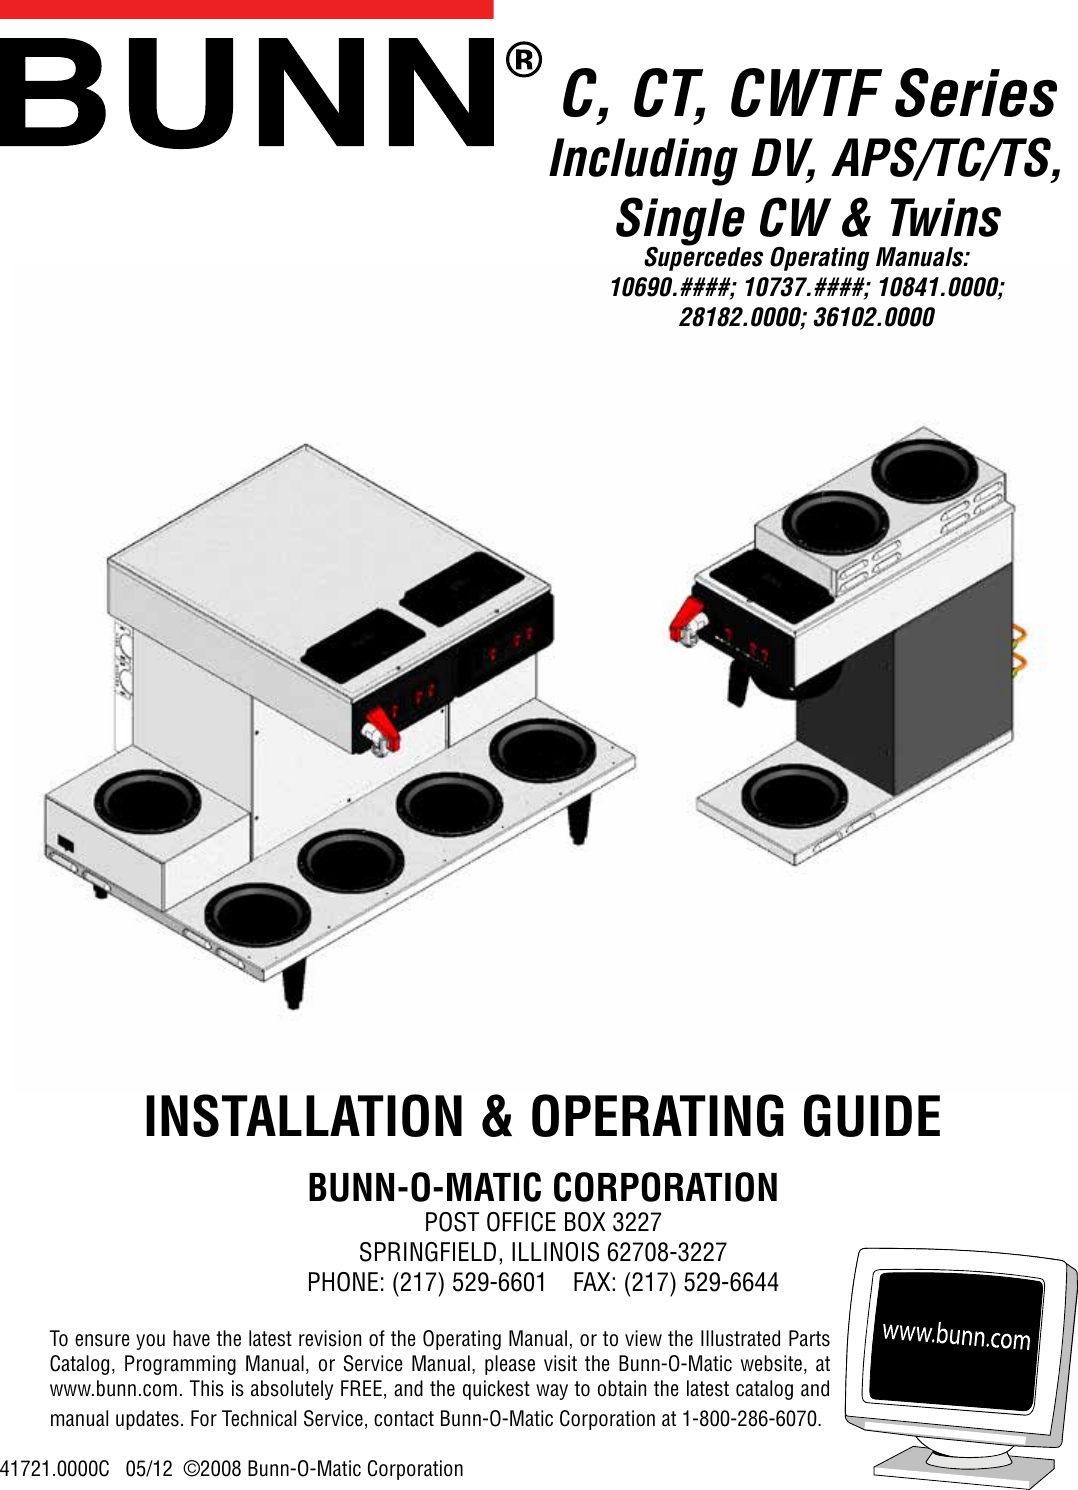 Bunn Cw Wiring Diagram Another Blog About Model Bx Series Wire Detailed Schematics Rh Jppastryarts Com